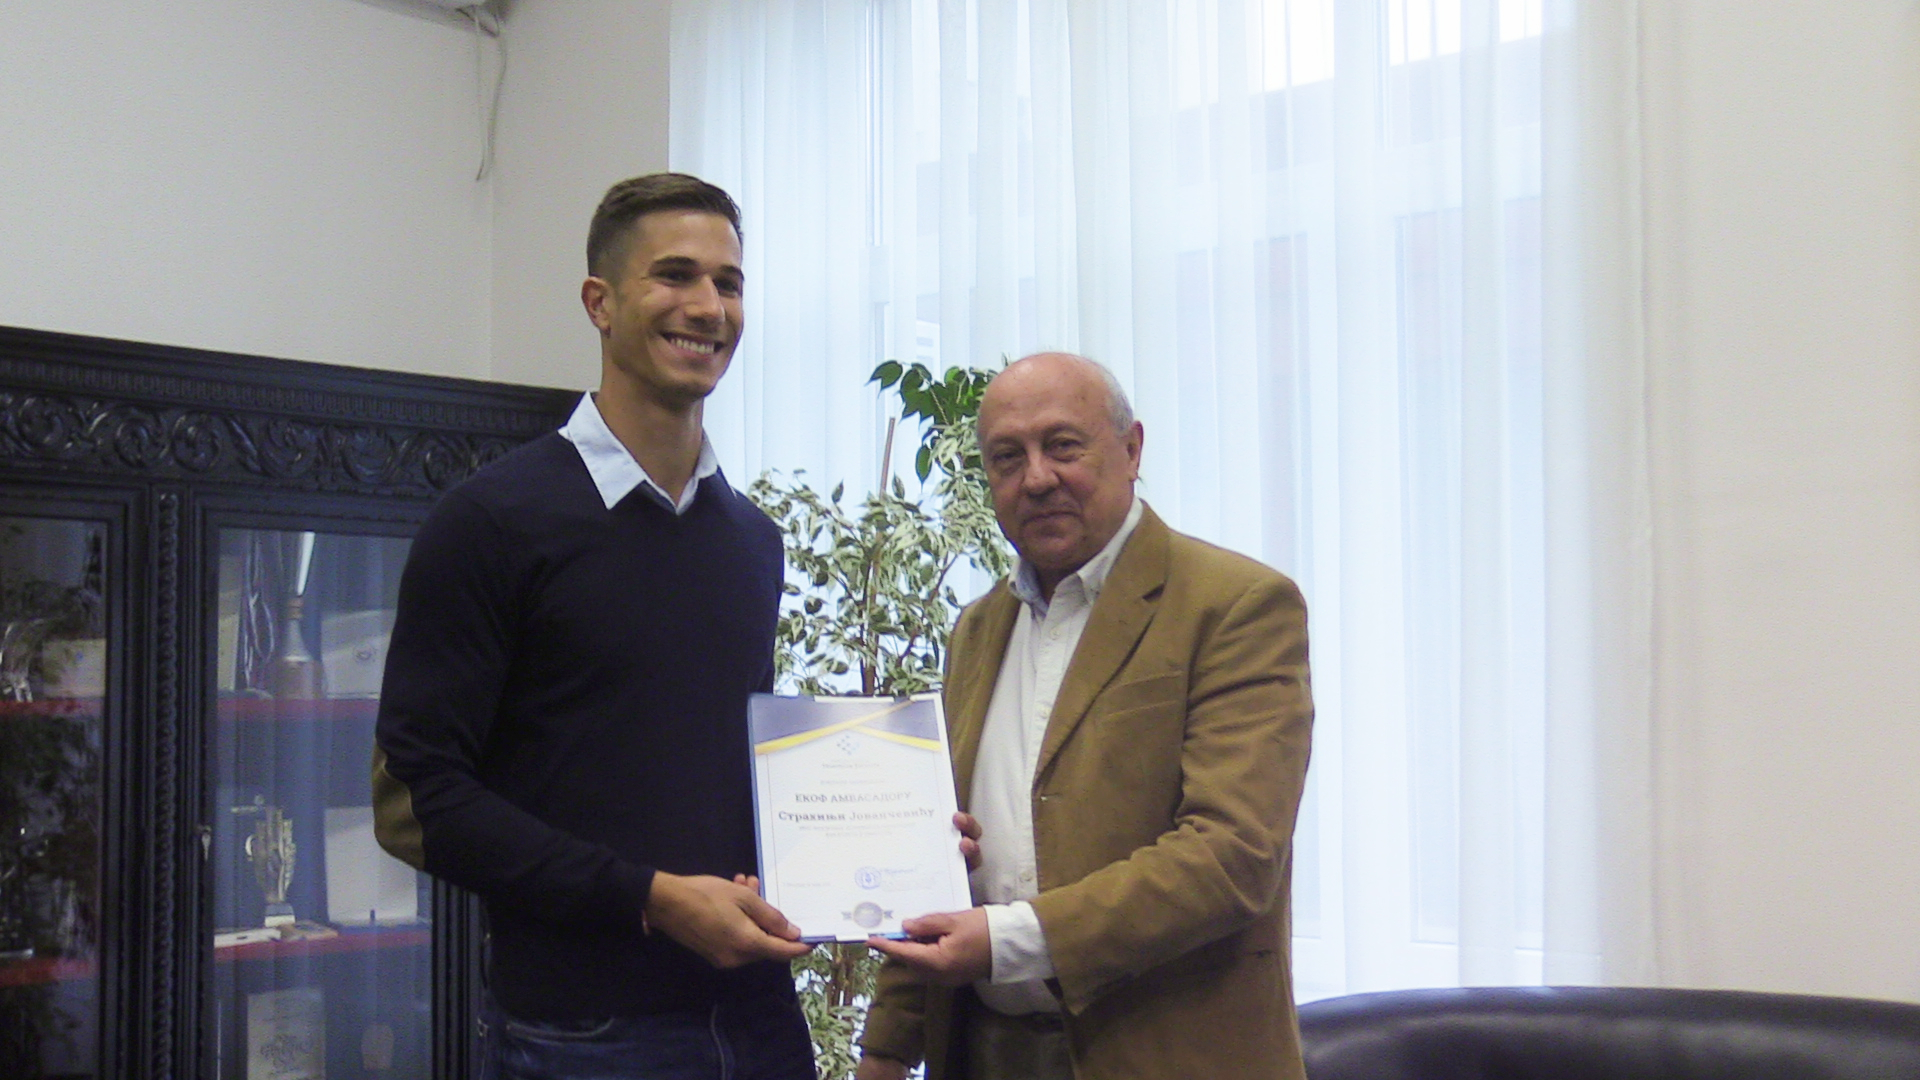 Prvi ambasador EKOF-a: atletičar Strahinja Jovančević